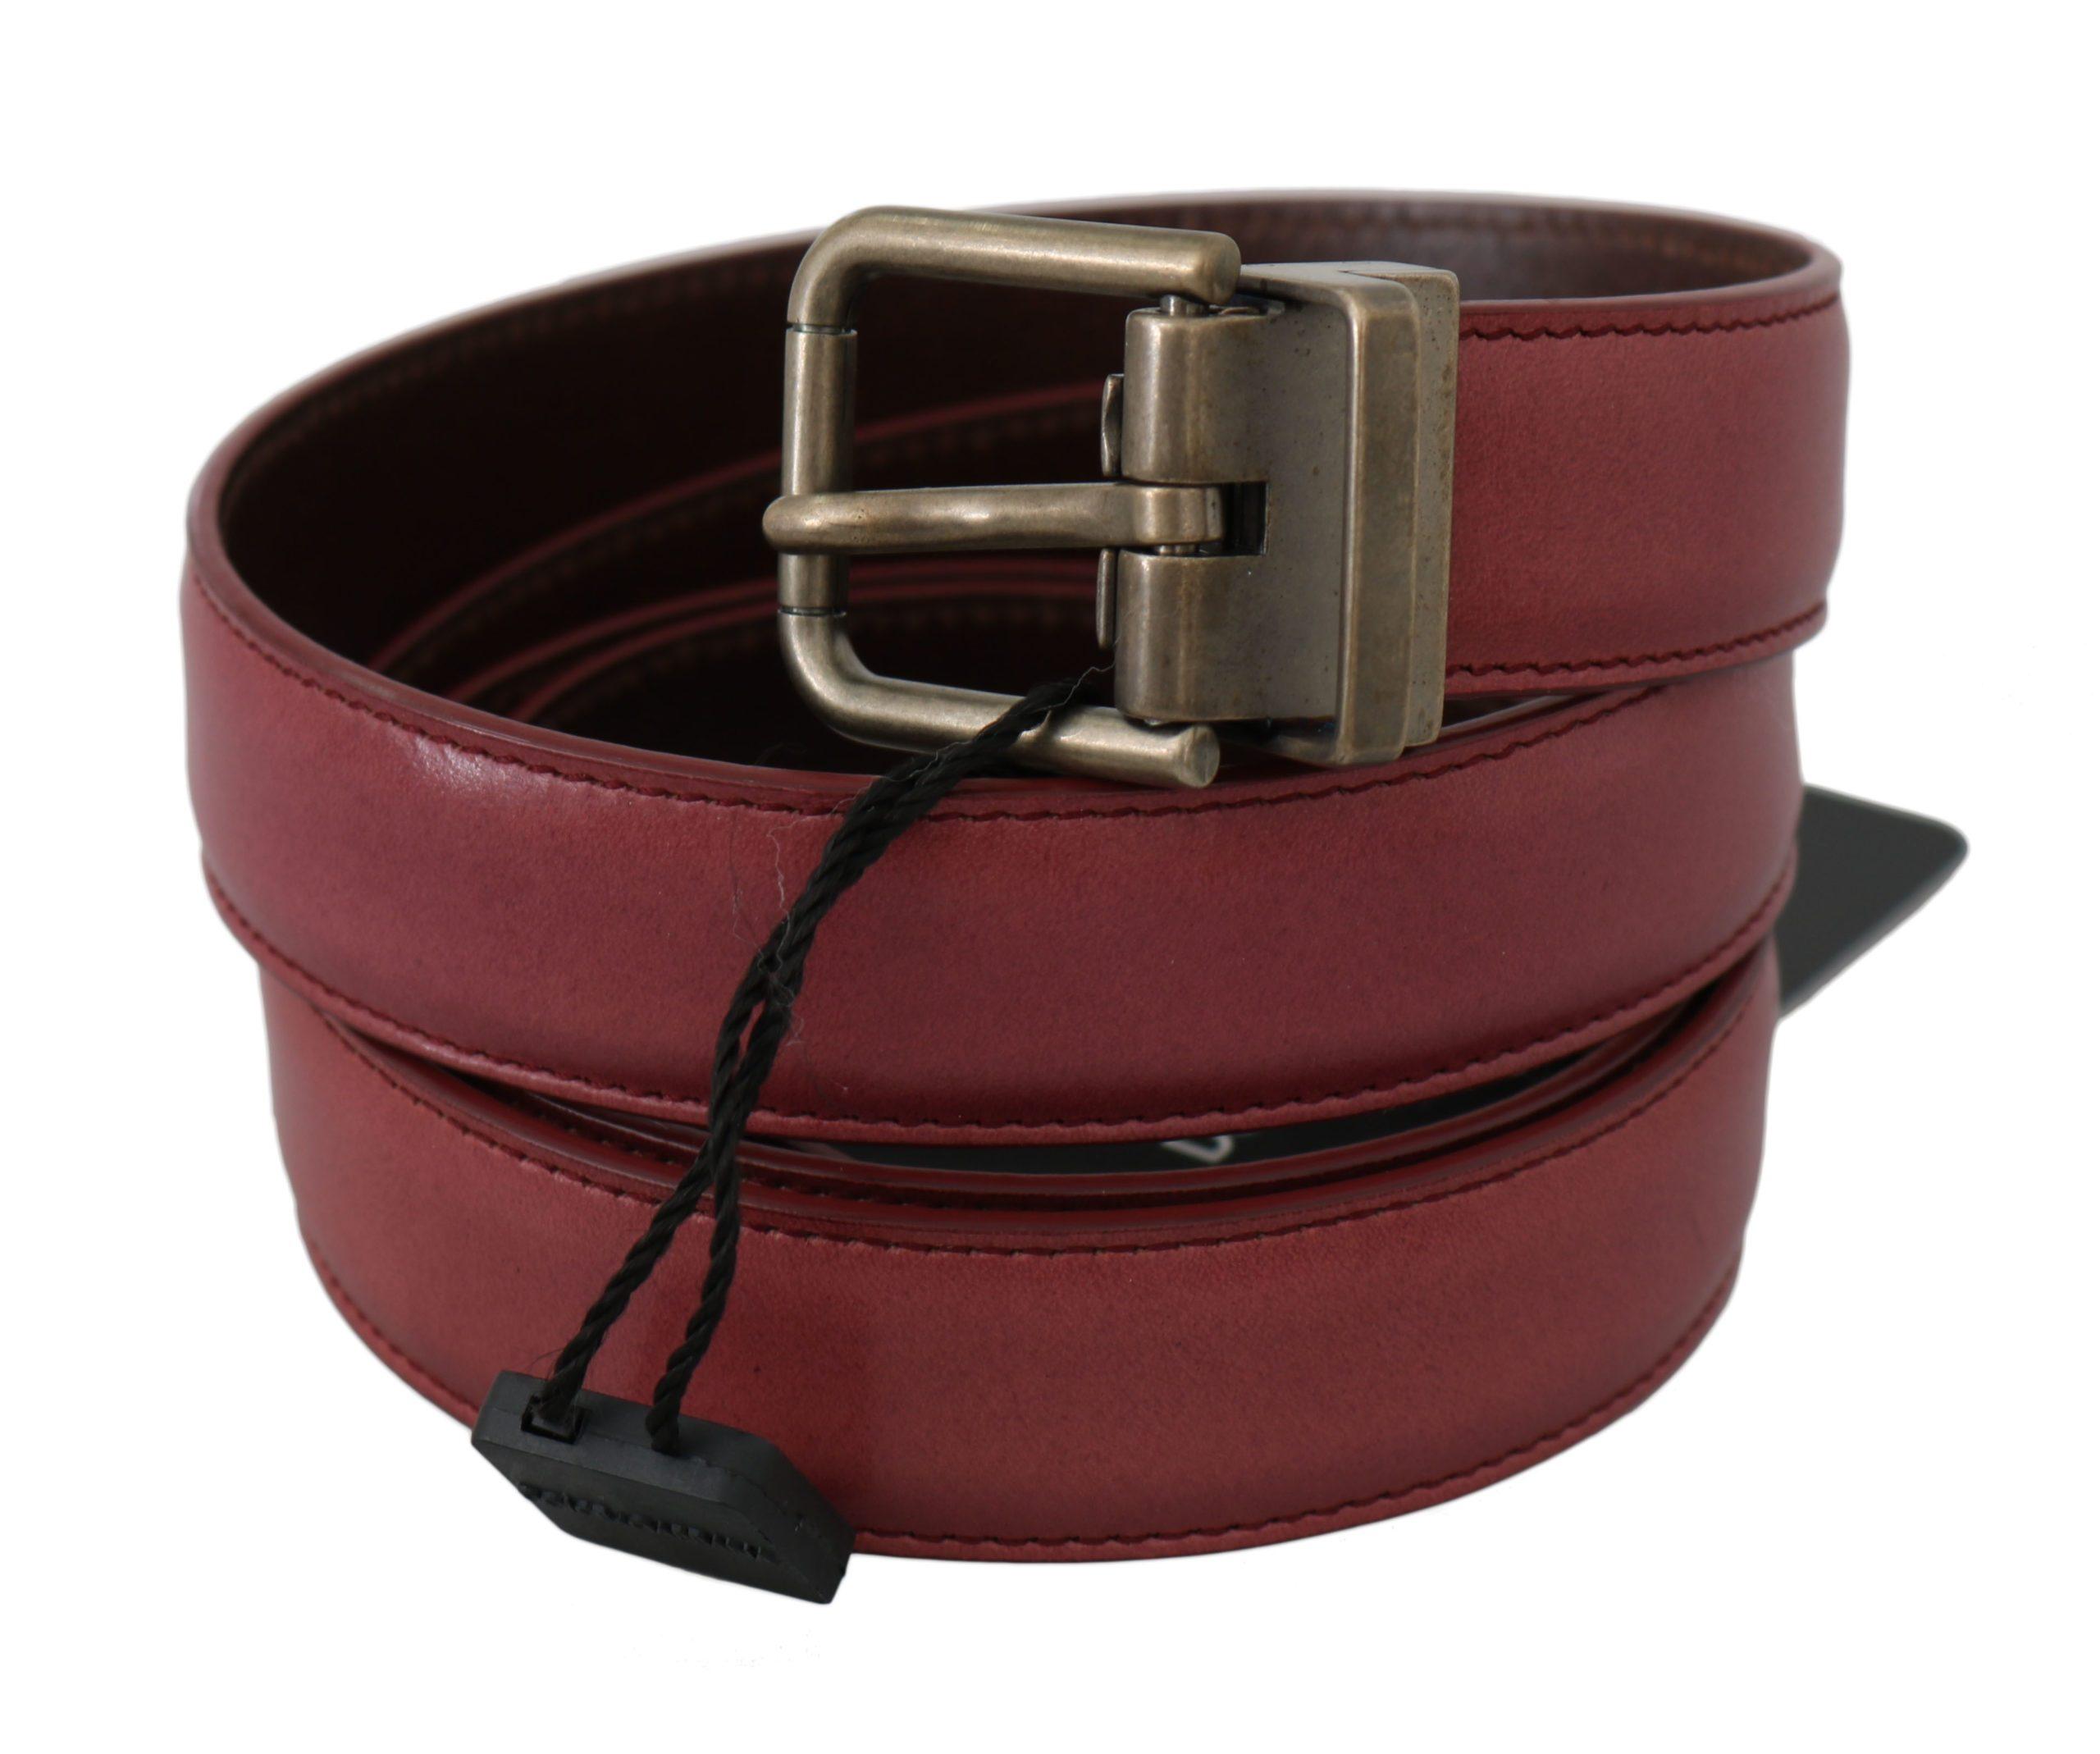 Dolce & Gabbana Men's Leather Metal Buckle Belt BEL60351 - 110 cm / 44 Inches